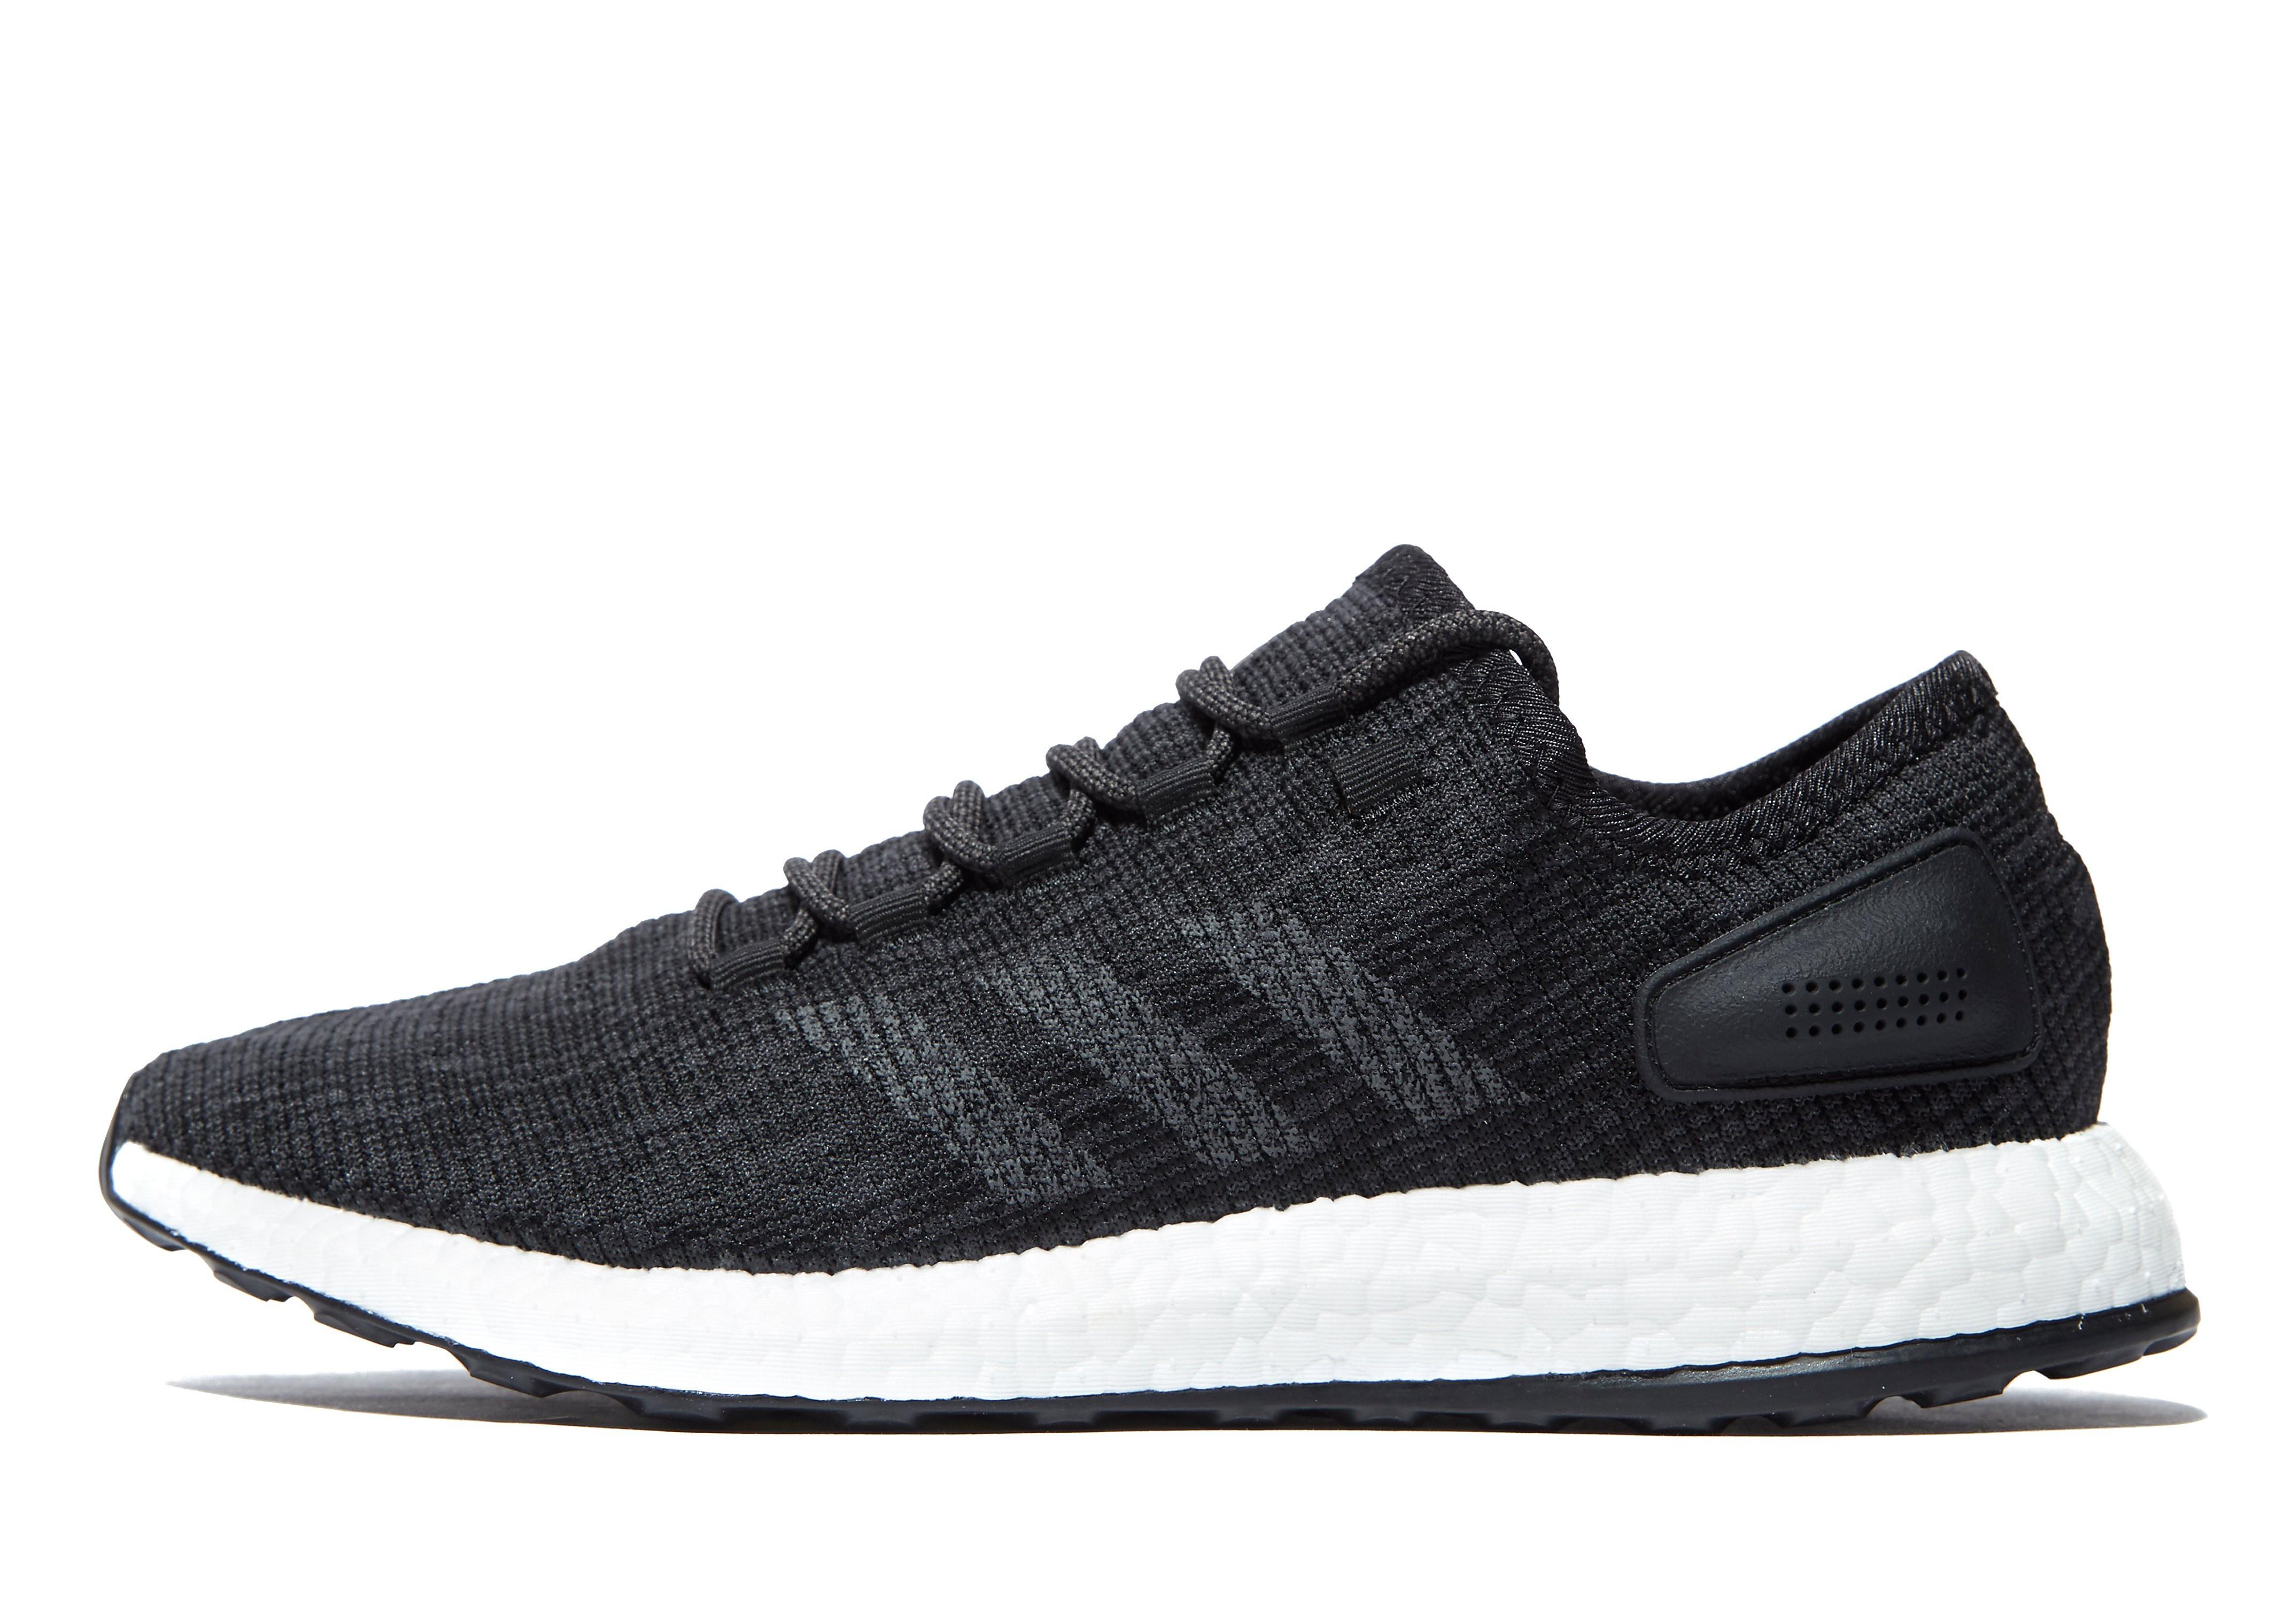 13c02c572 Shipping Adidas Y3 Pure Boost London Nike Instagram